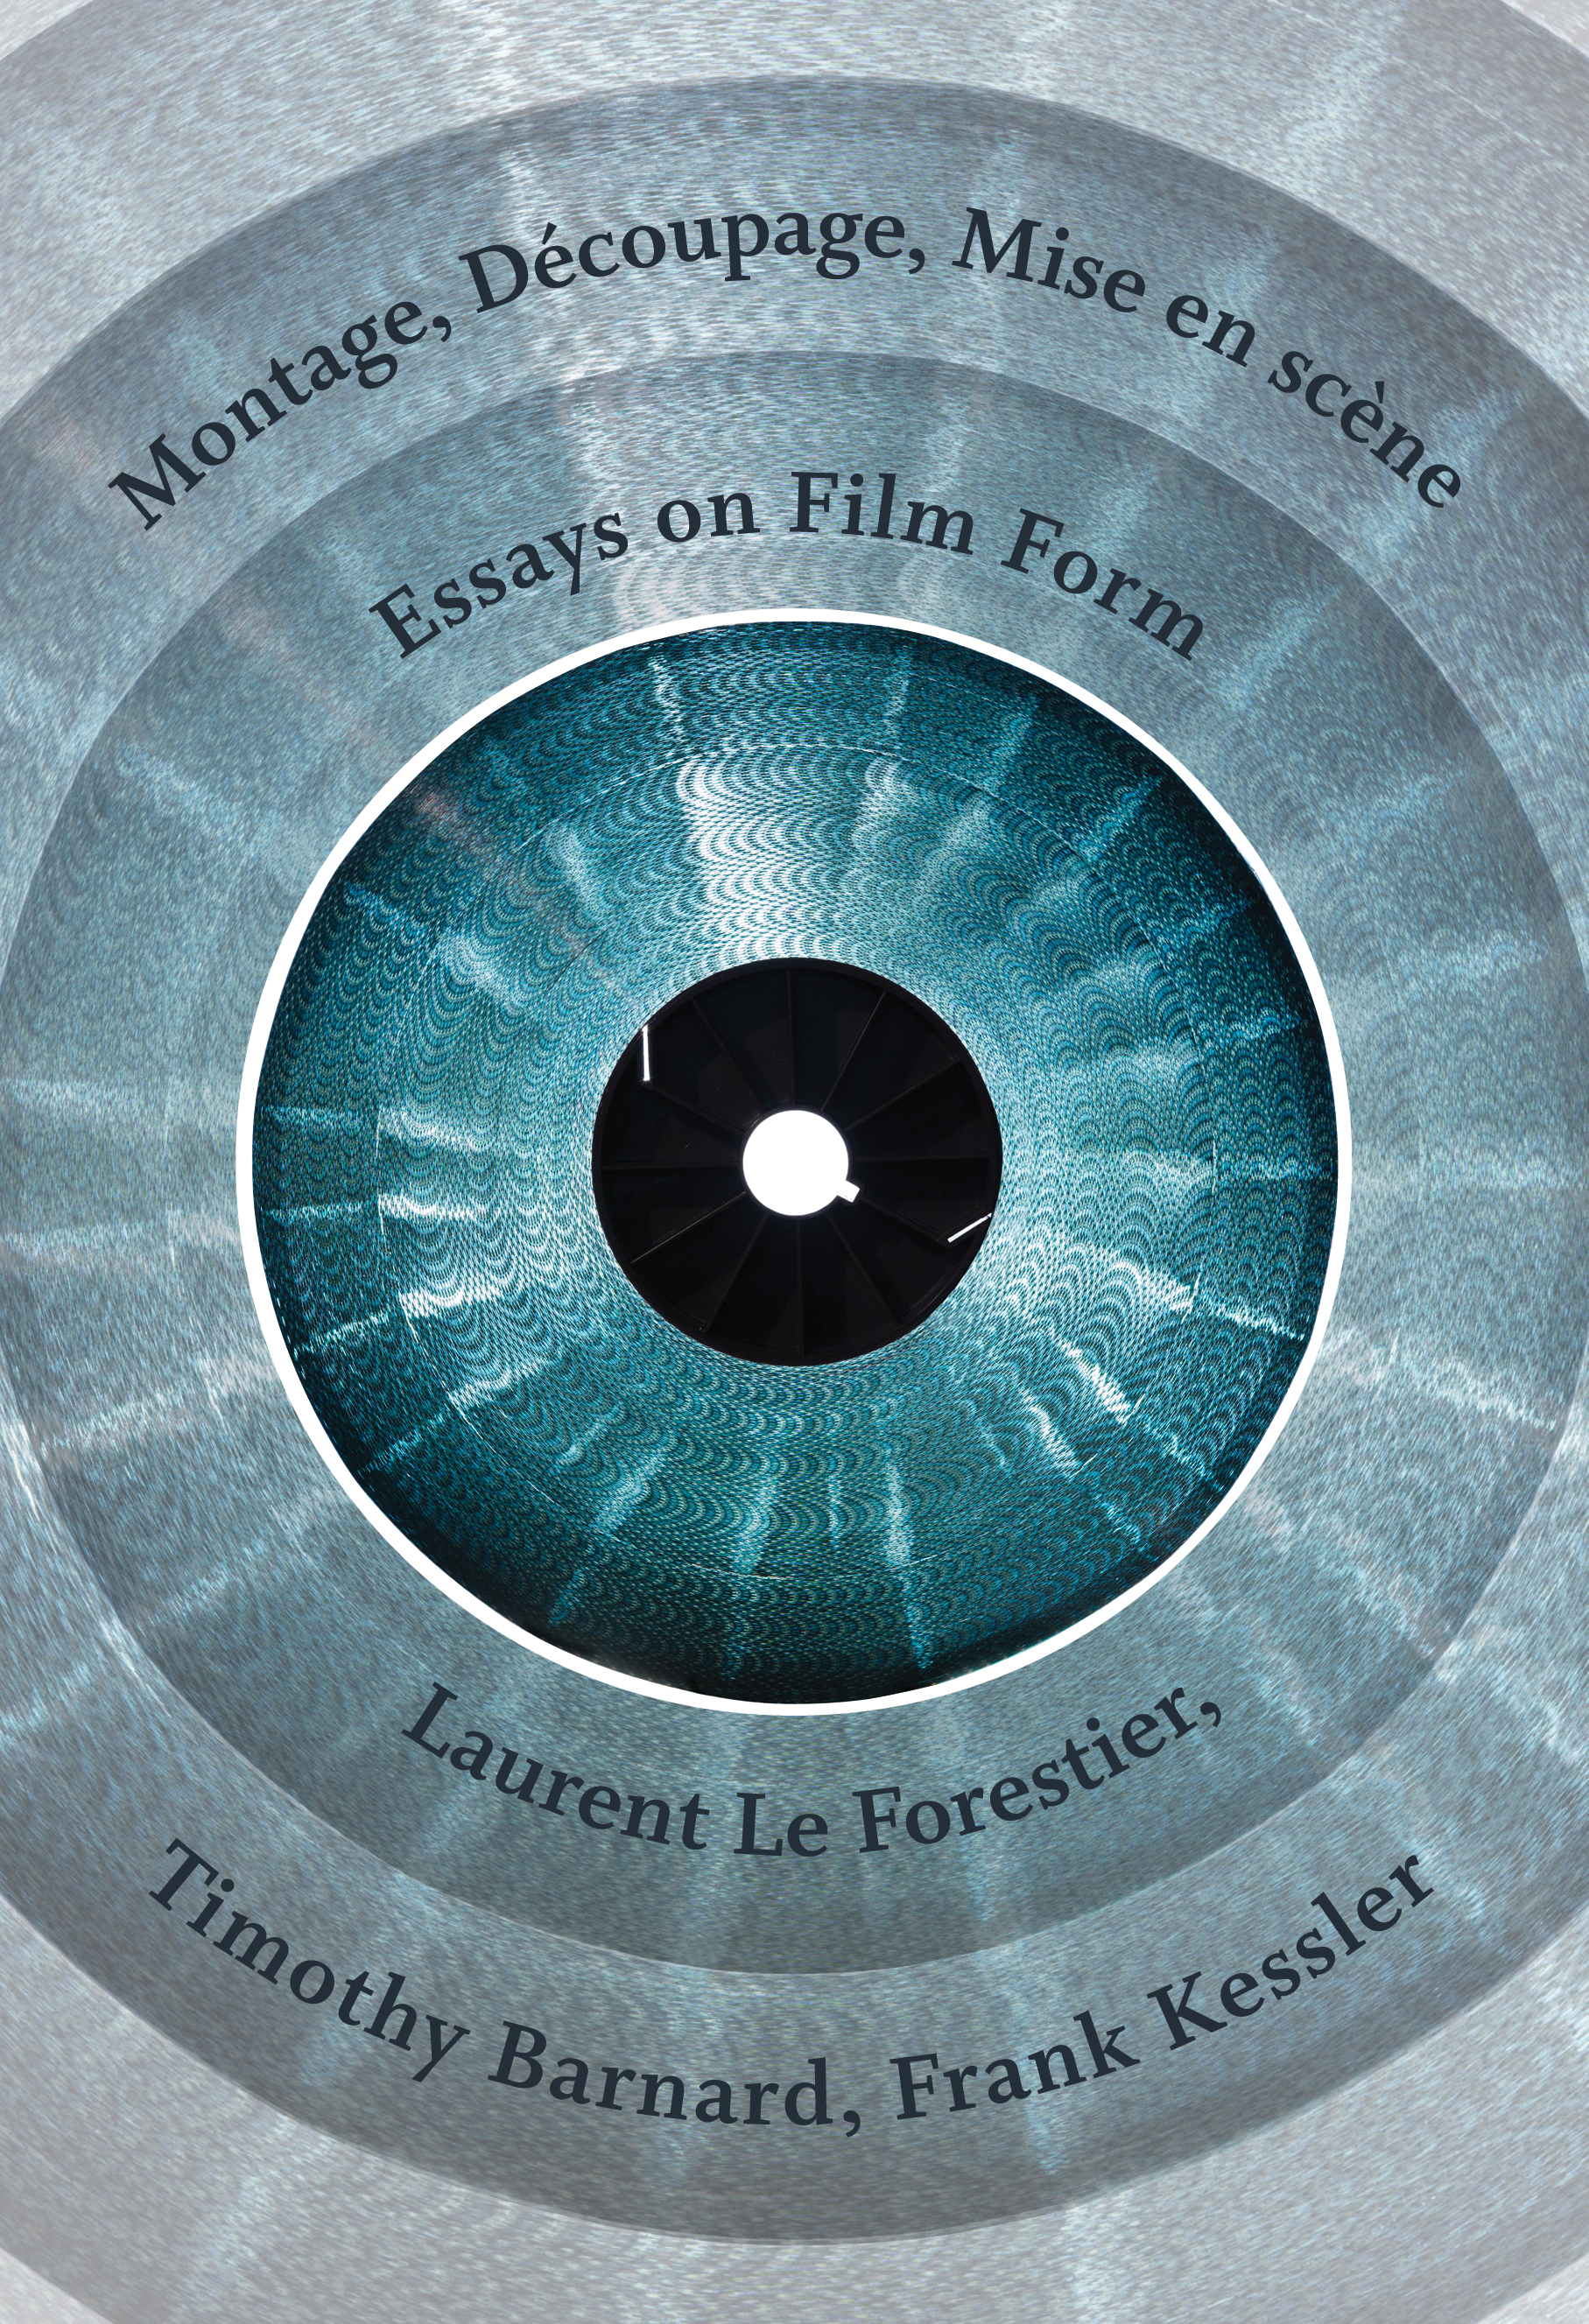 Montage Decoupage Mise En Scene Essays On Film Form Caboose